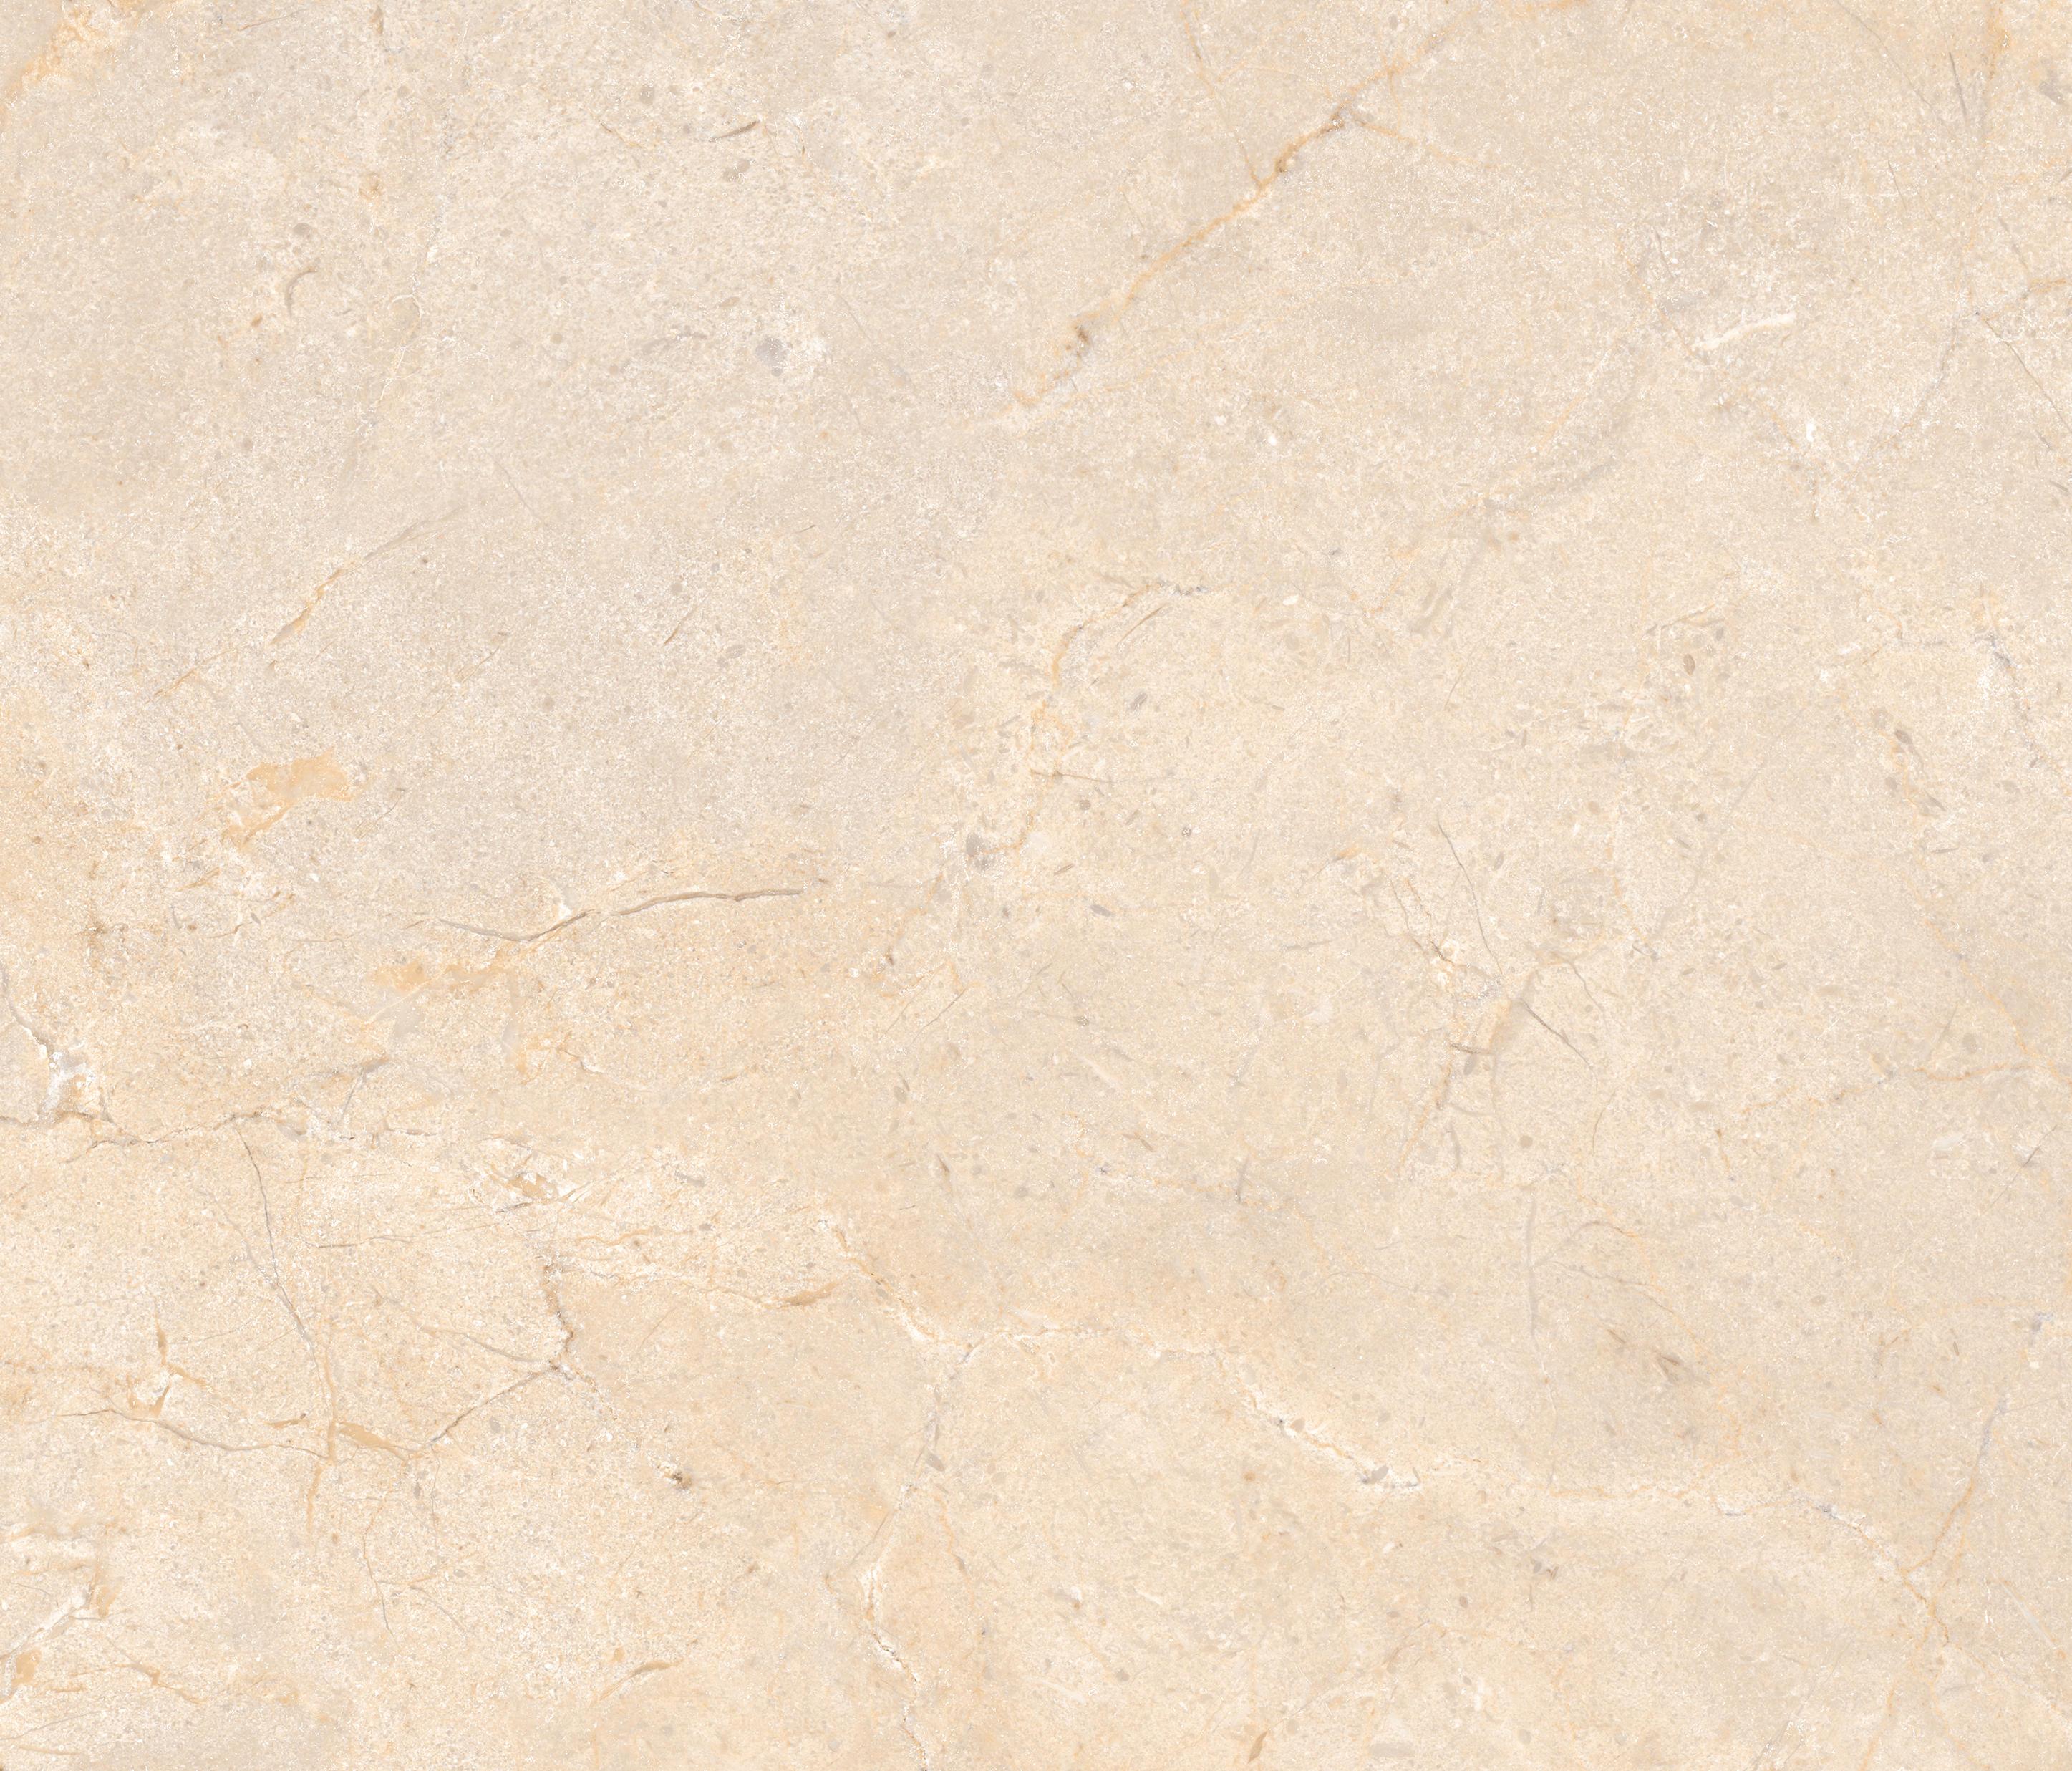 Crema Marfil Crema Marfil Ceramic Tiles From Keraben